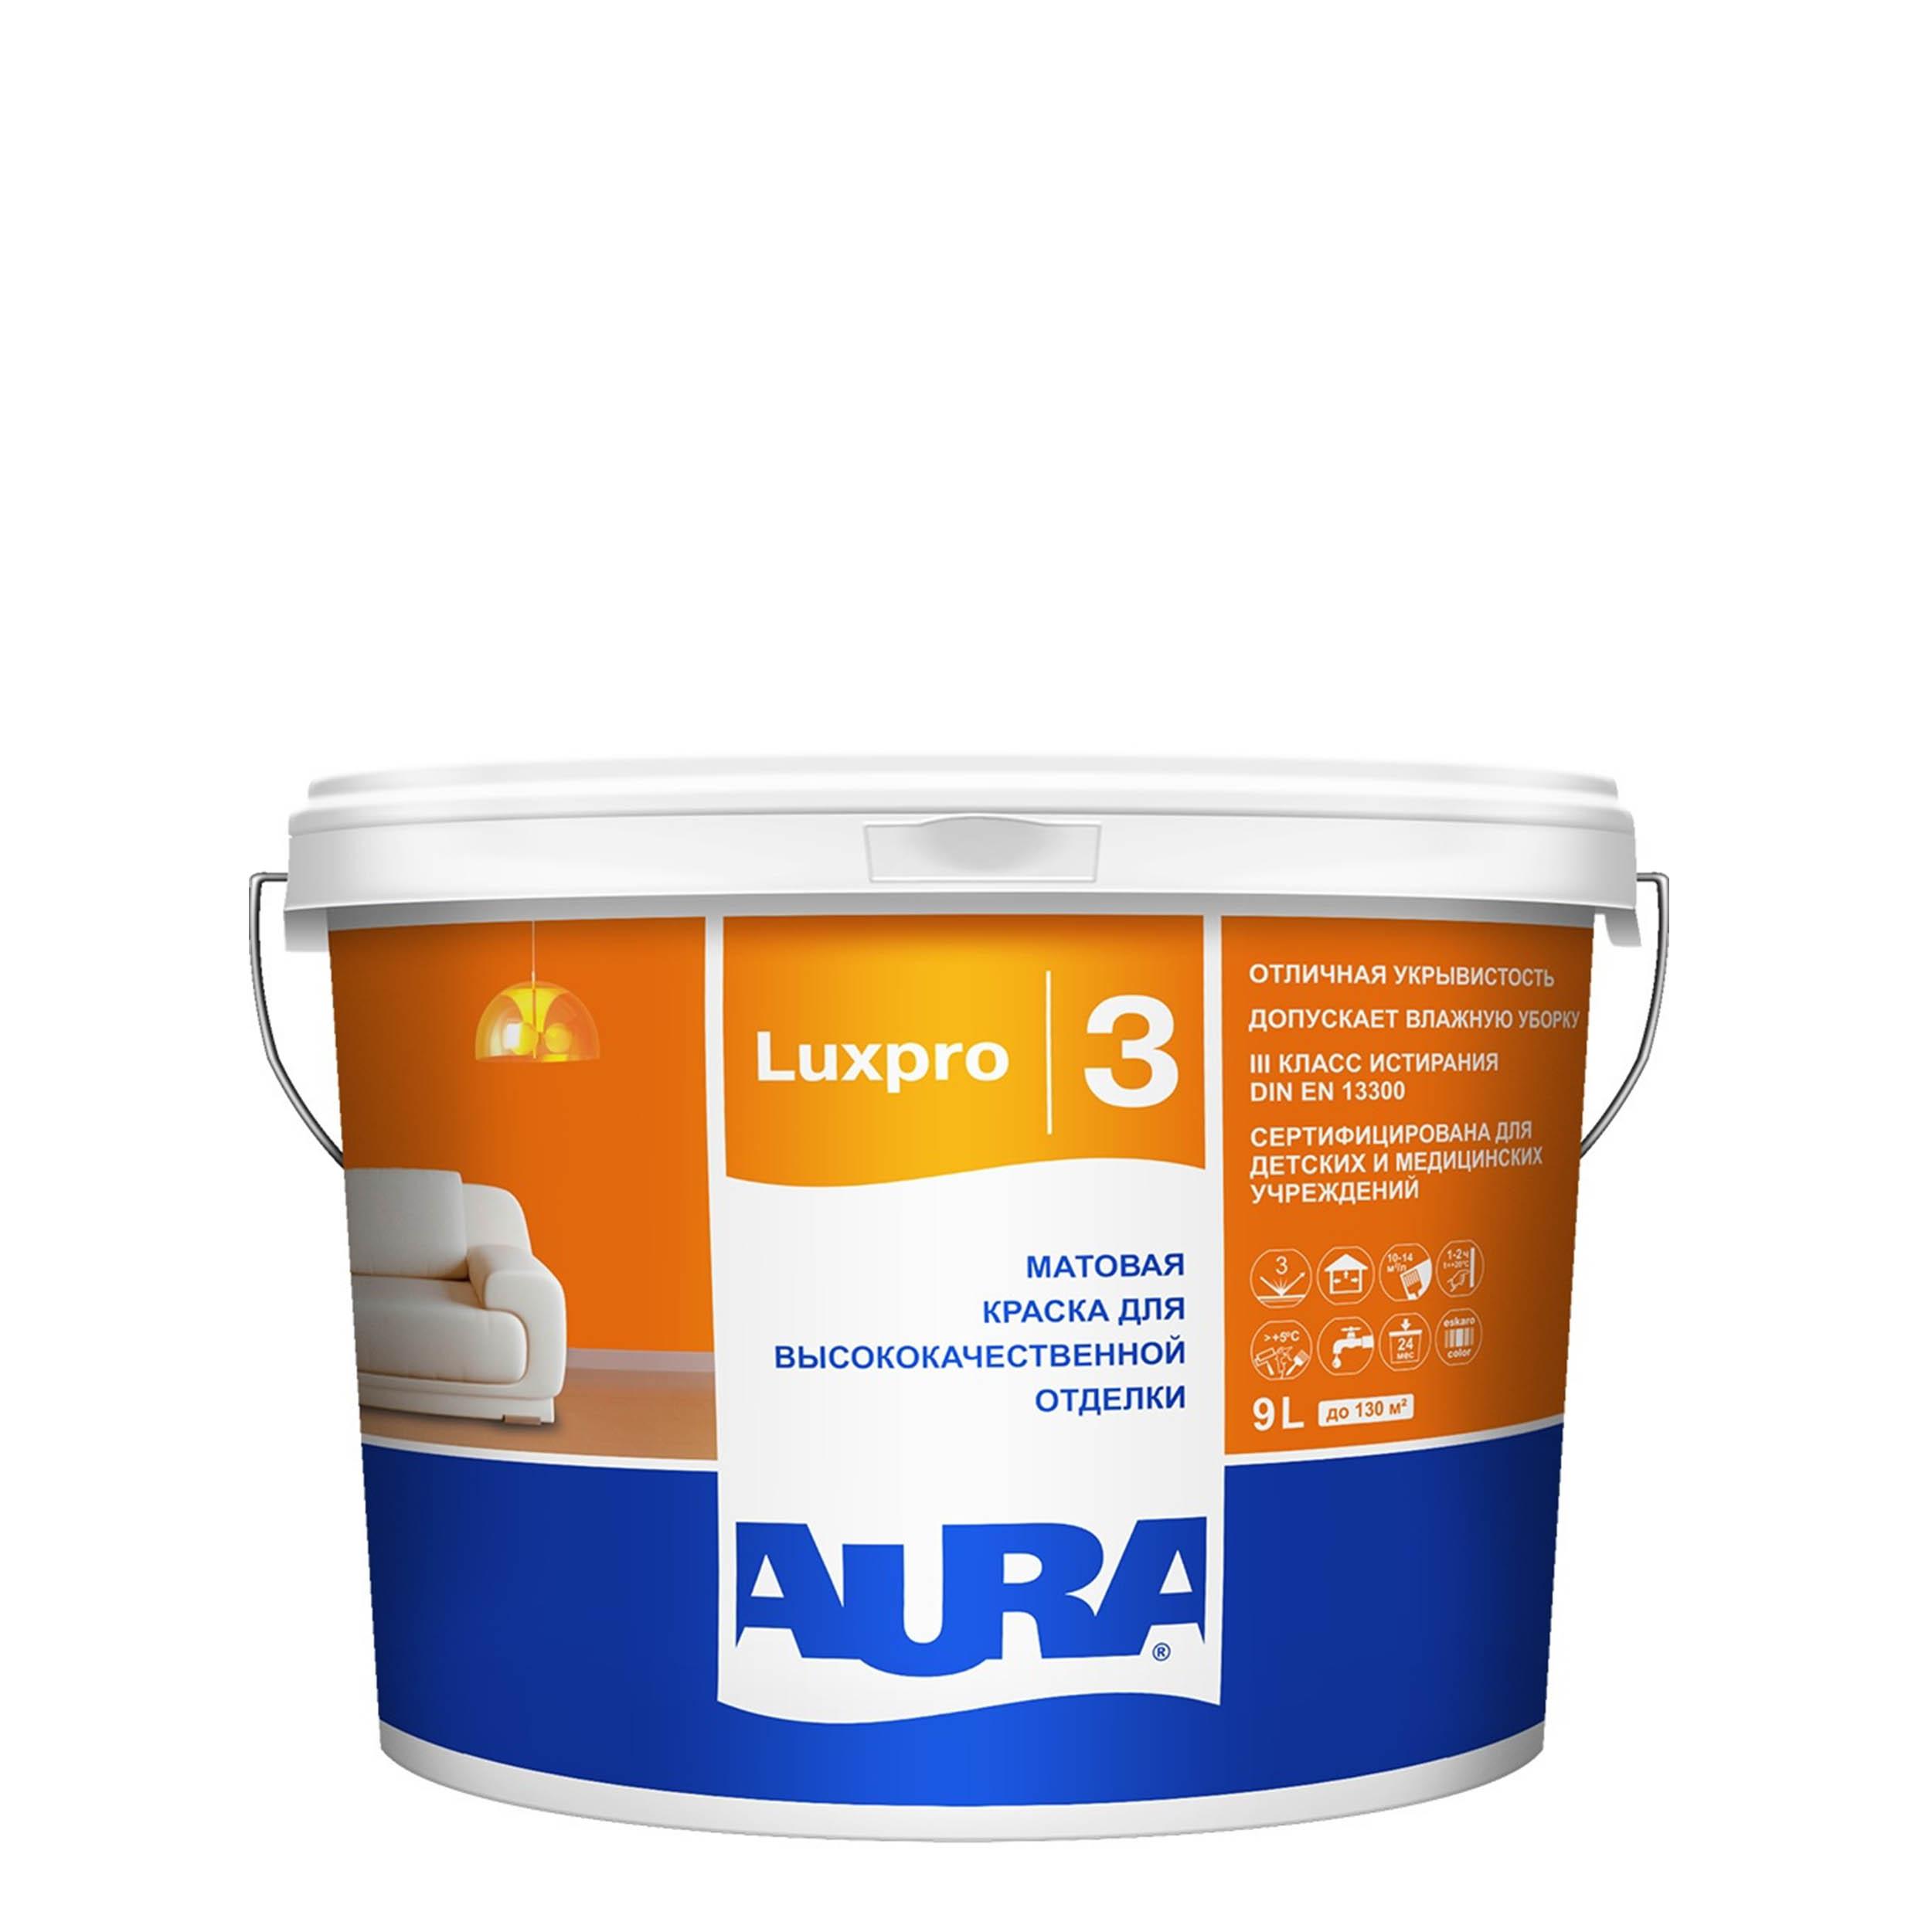 Фото 17 - Краска интерьерная, Aura LuxPRO 3, RAL 1019, 11 кг.